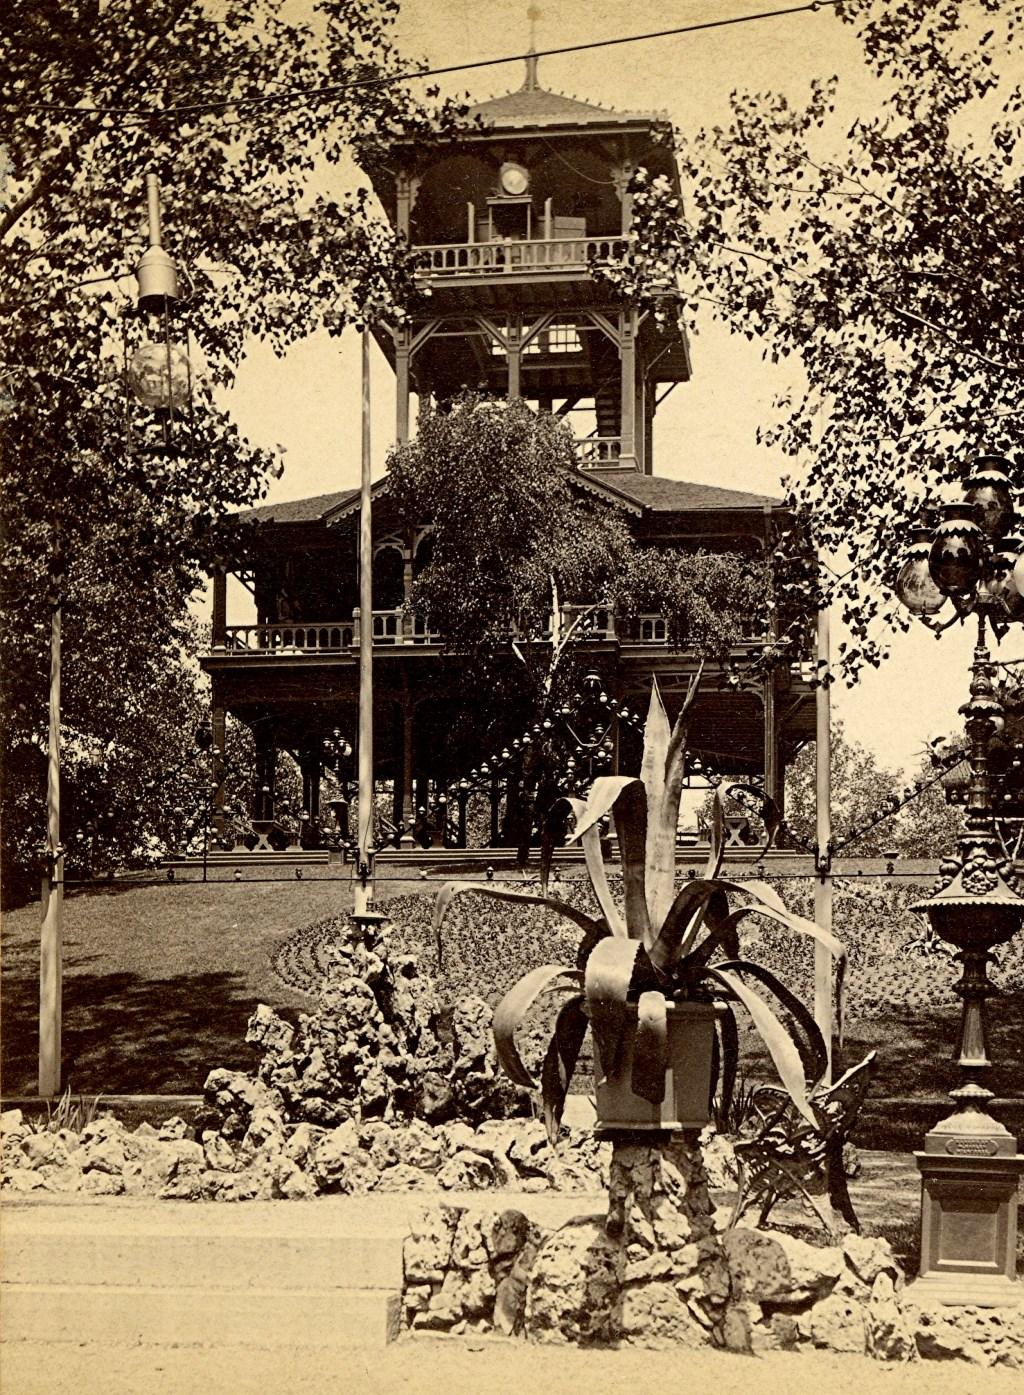 Schlitz Garden's Observation Tower, 1880s. Image courtesy of Jeff Beutner.